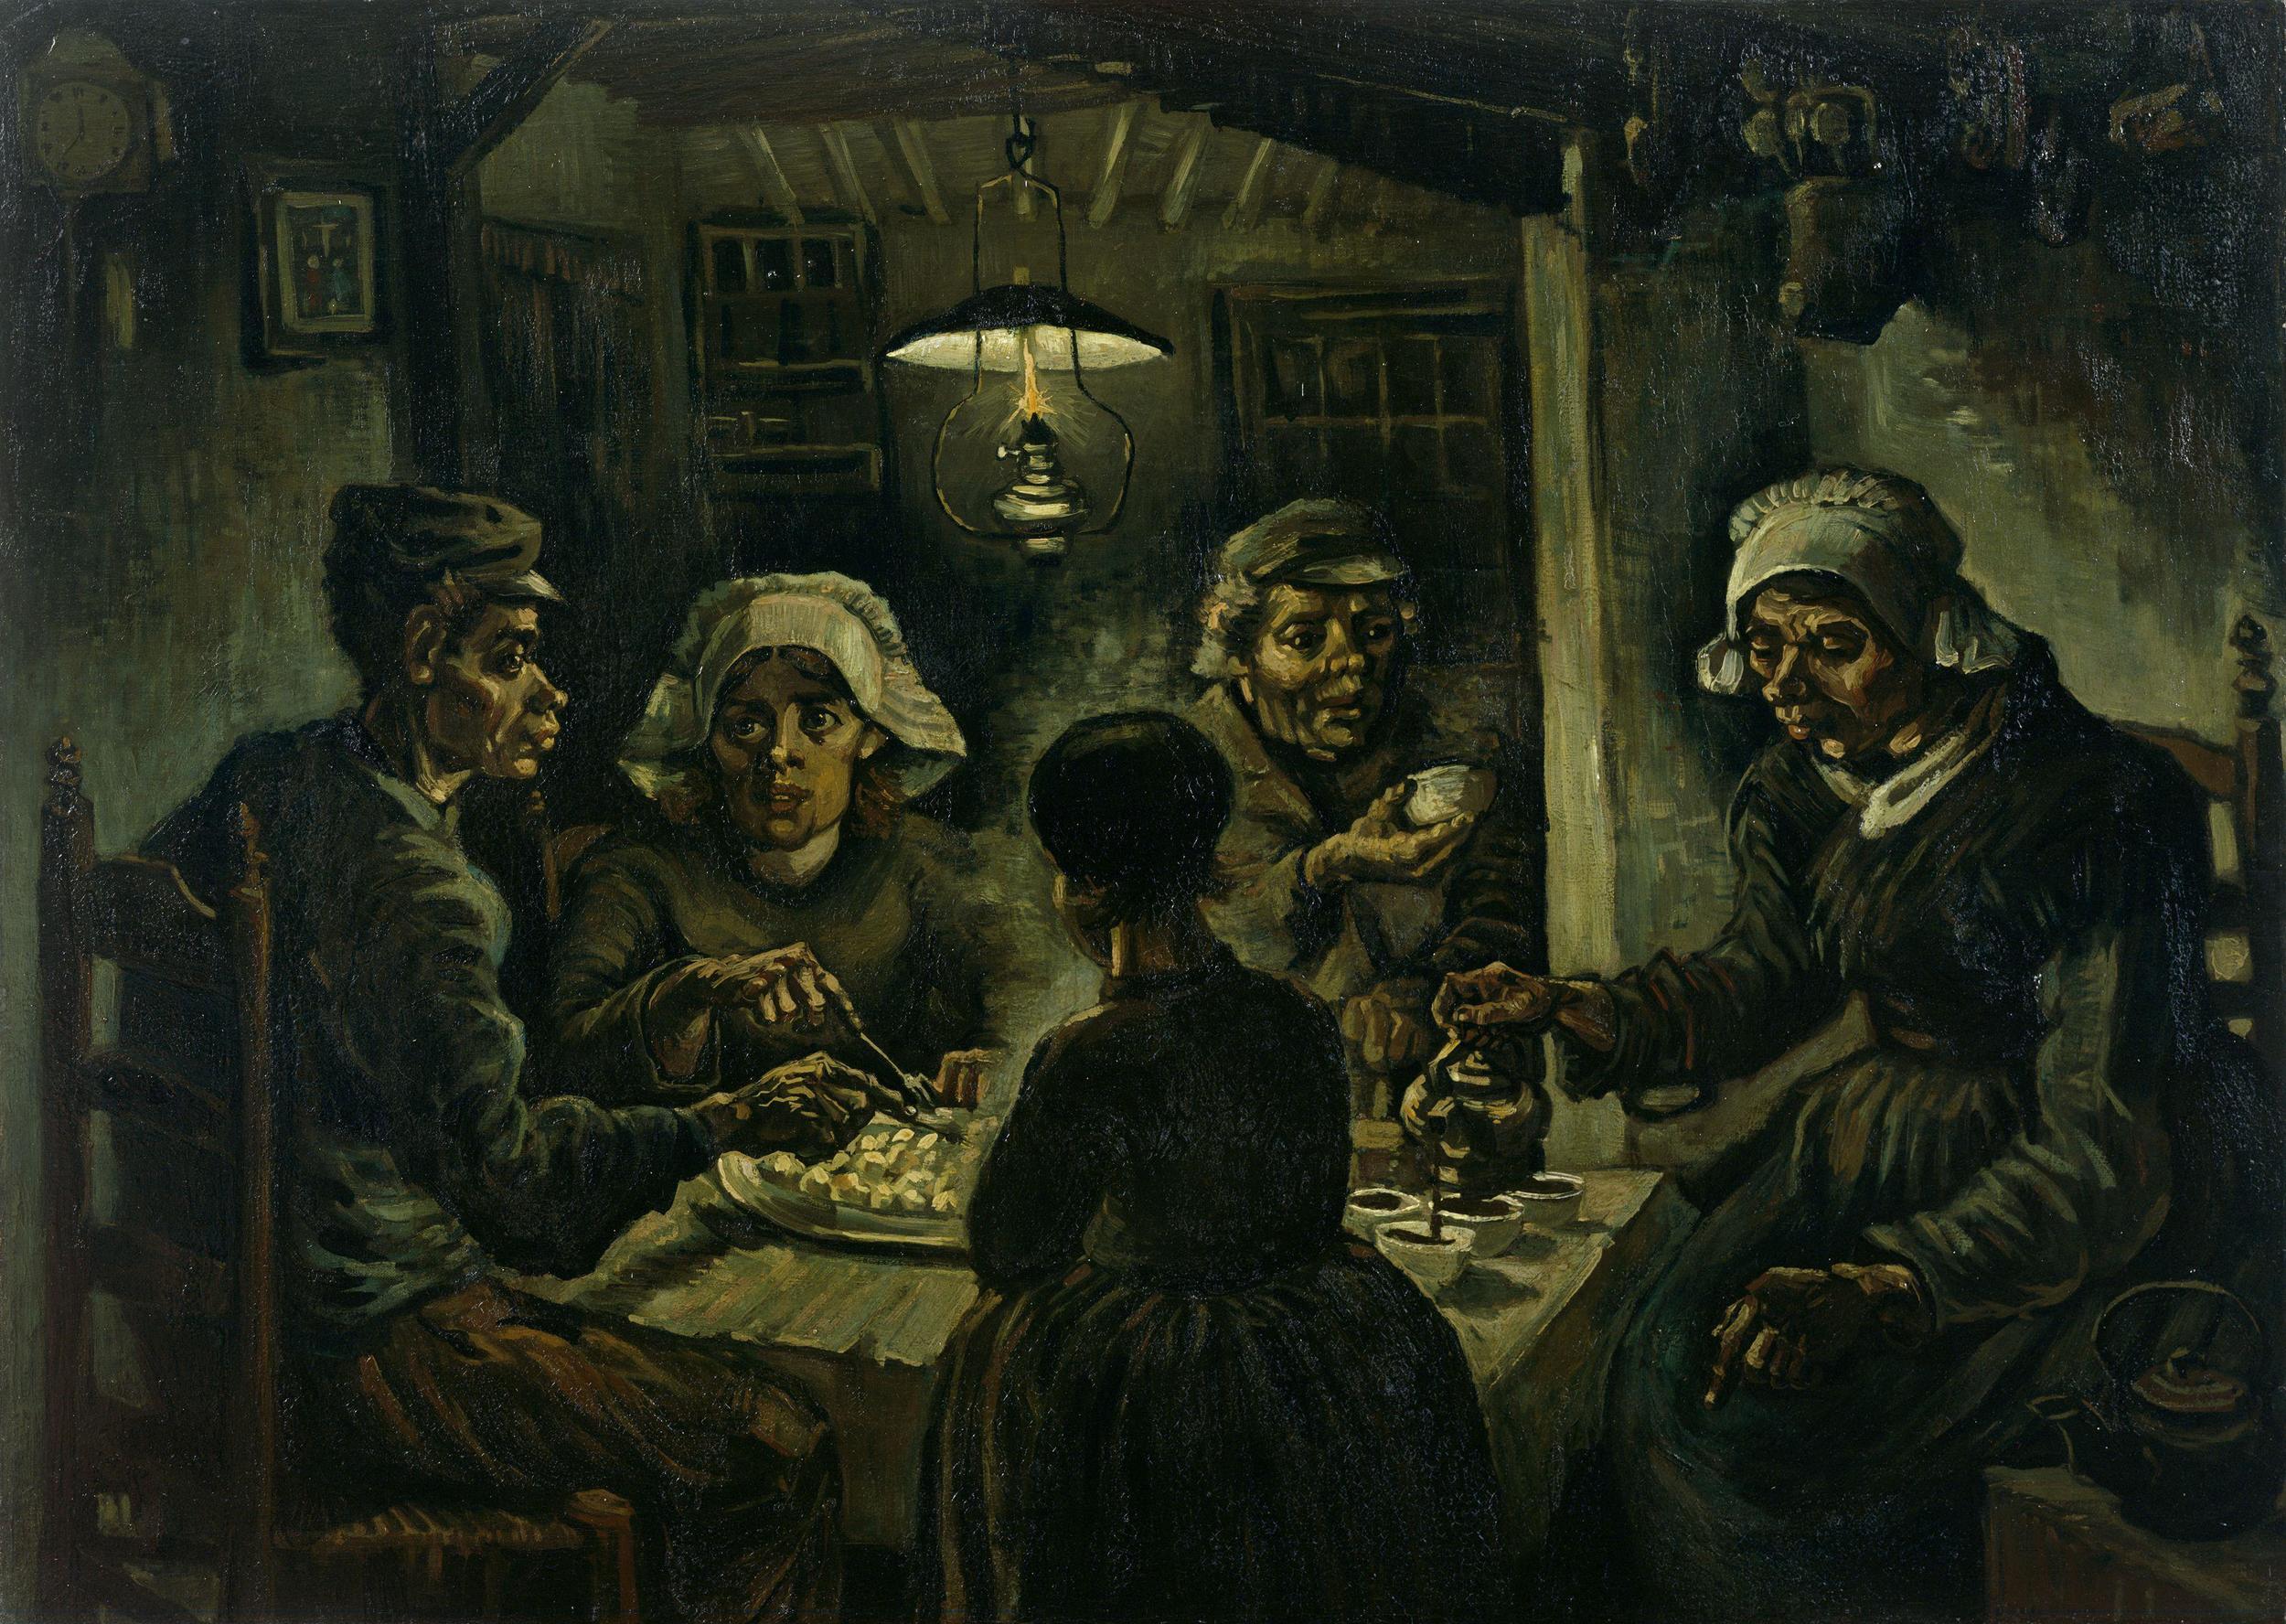 Vincent Van Gogh, The Potato Eaters, 1885, Oil on canvas